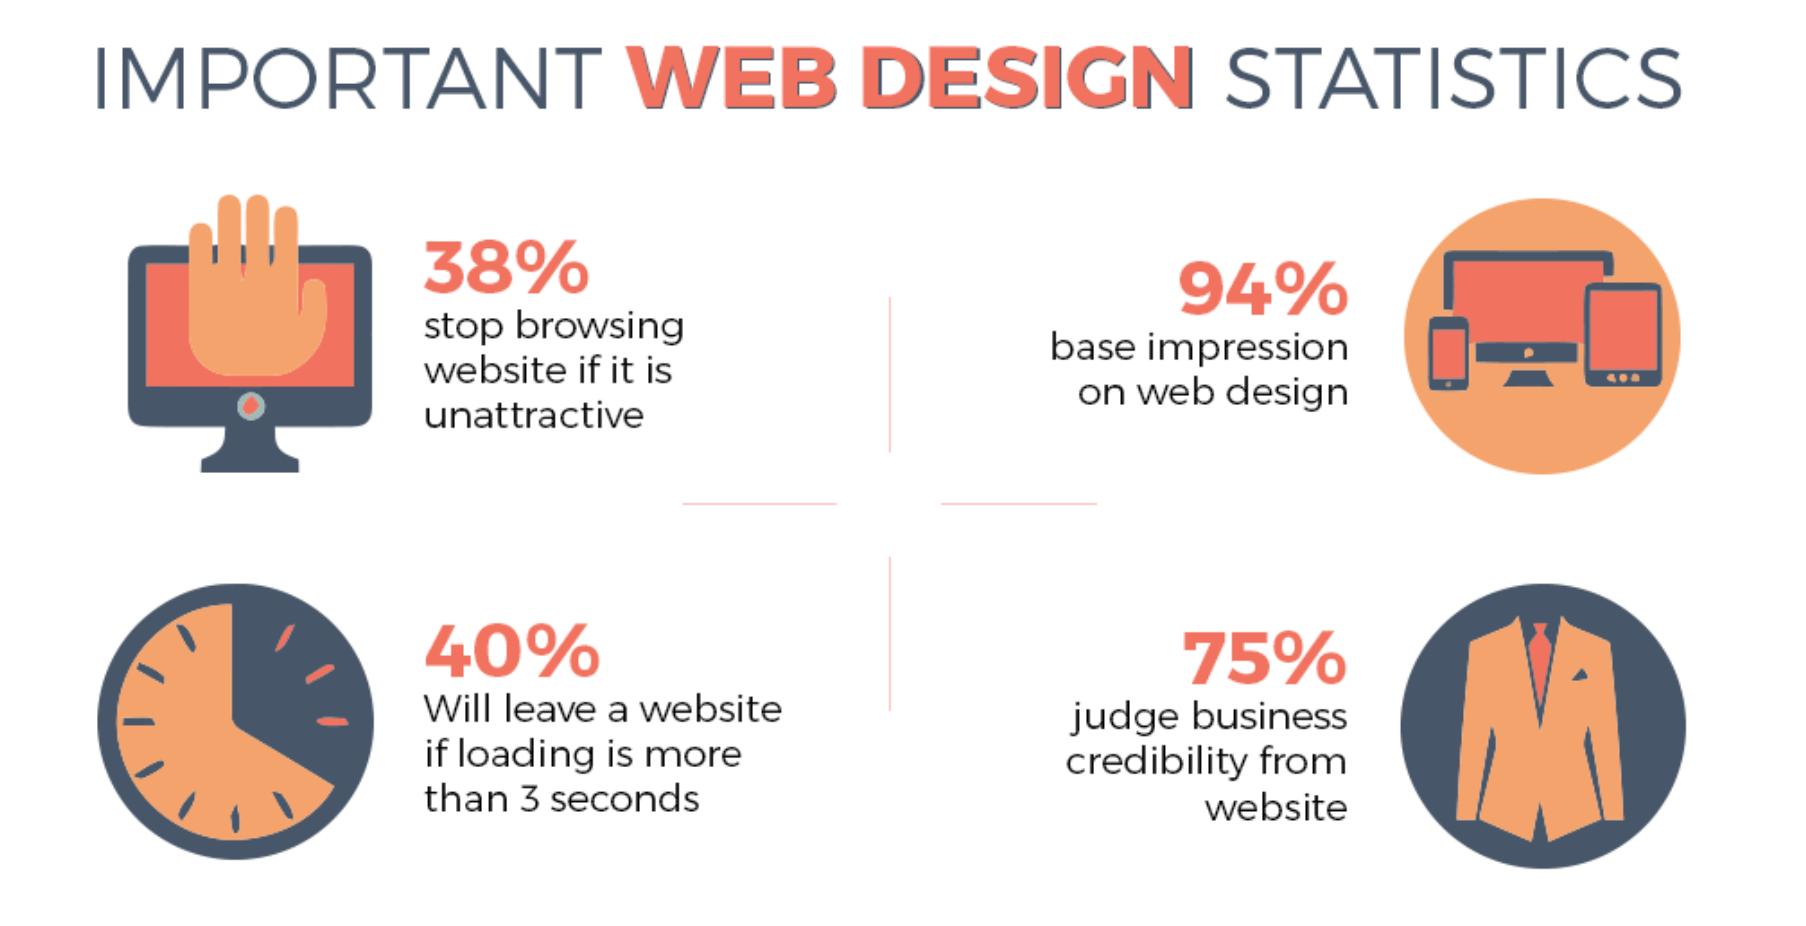 Belang van goed Webdesign